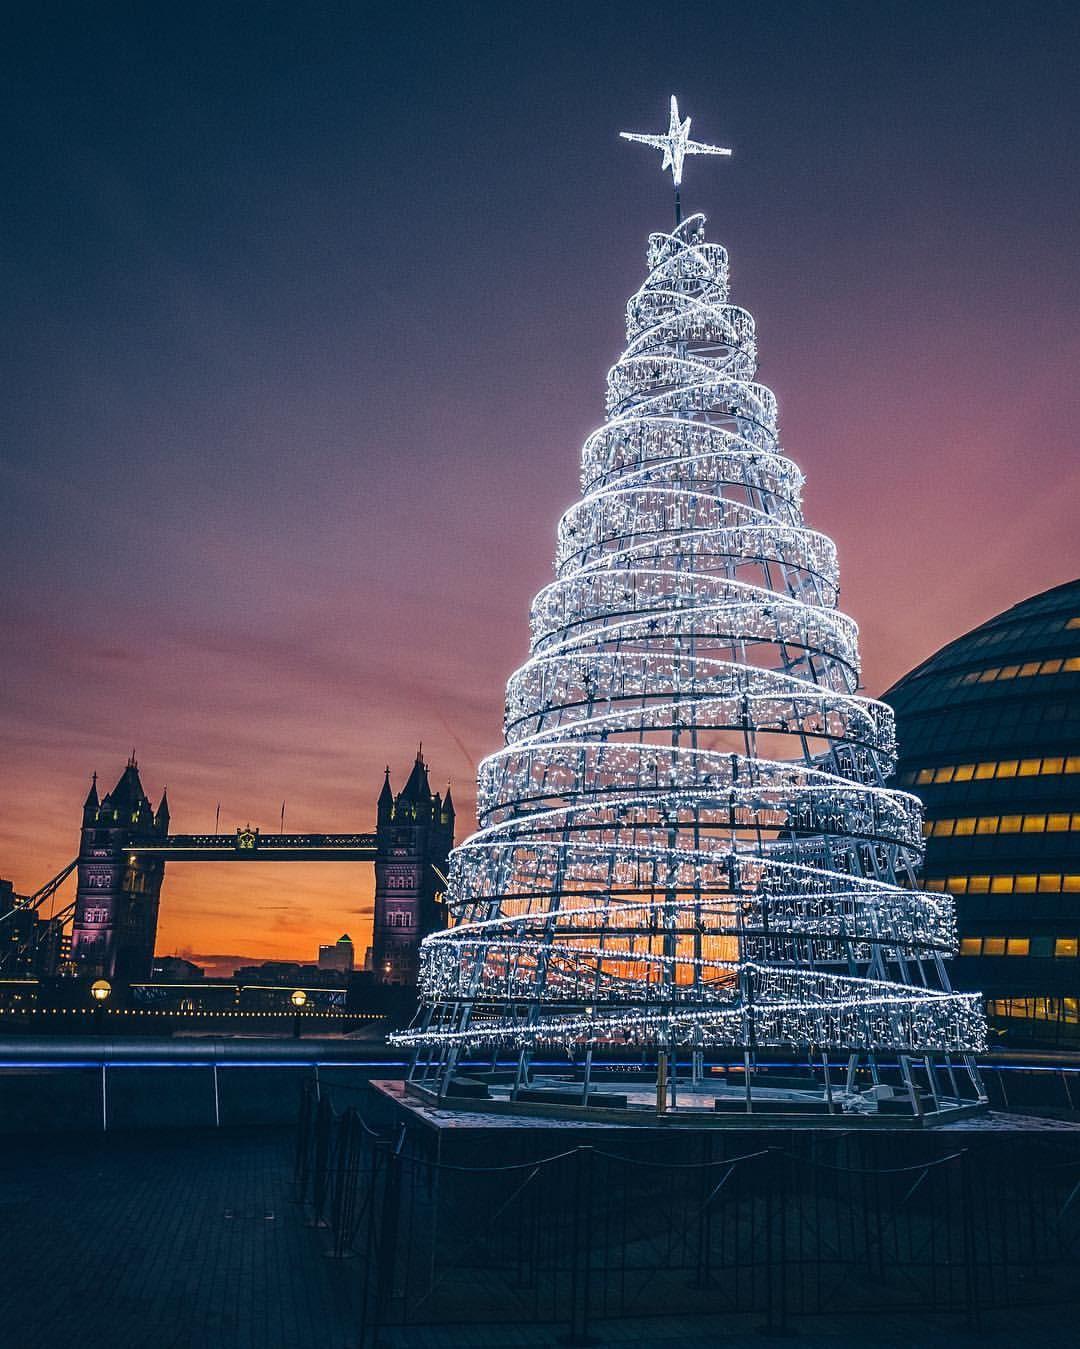 Christmas tree by London's Tower Bridge shot by alanisko on Instagram